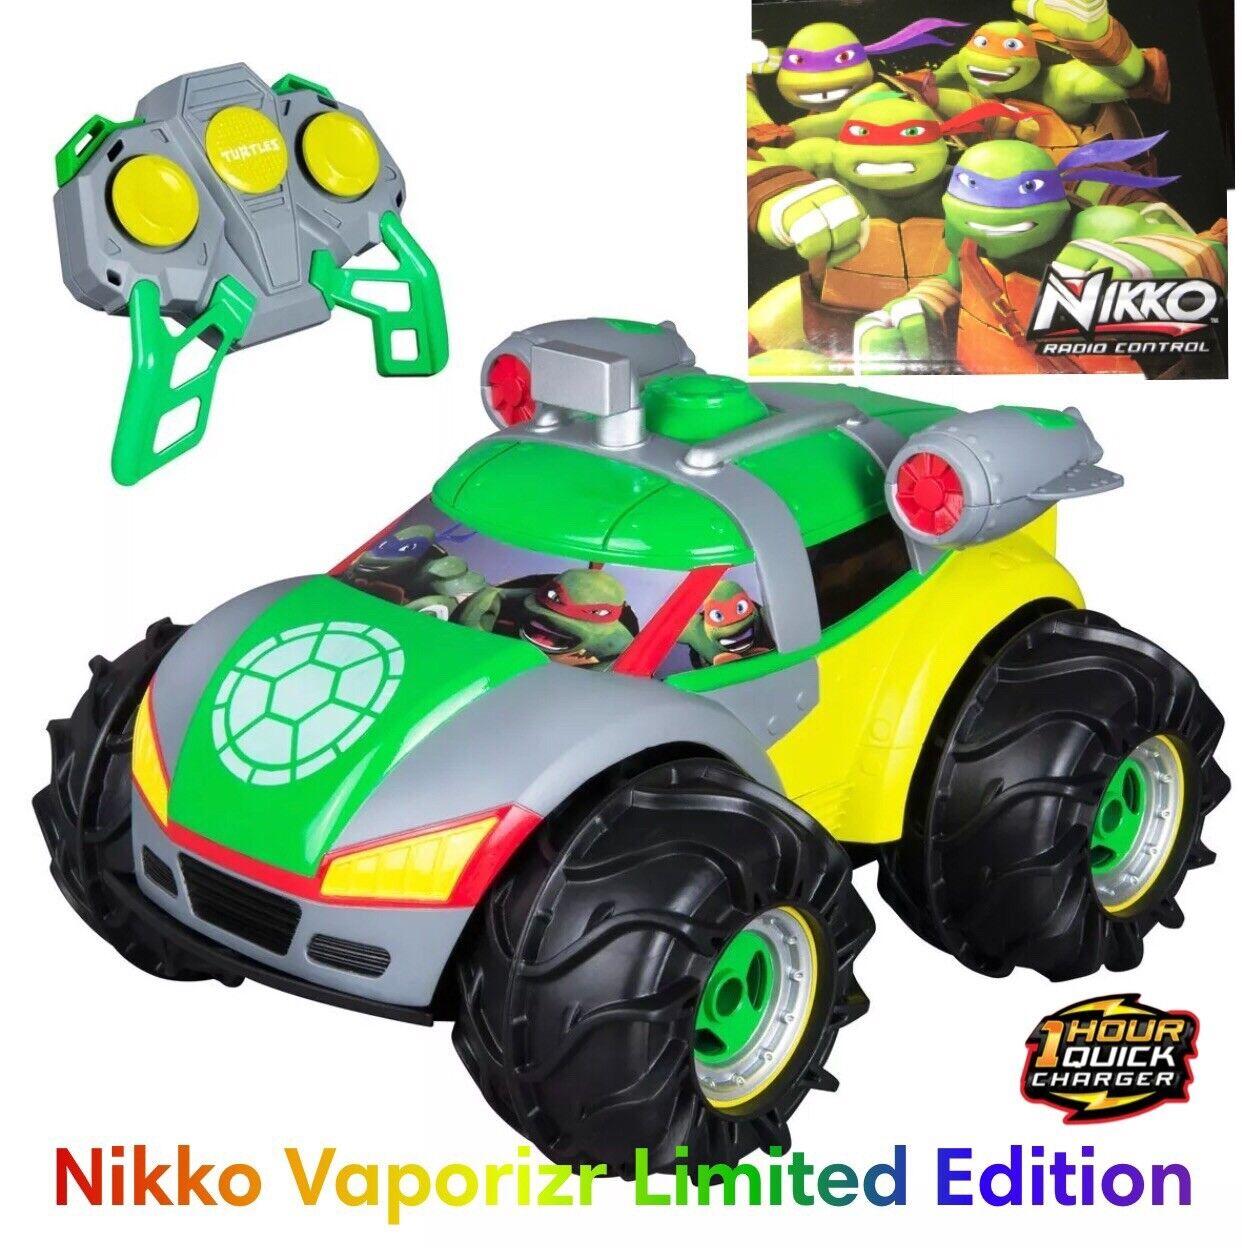 Nikko Vaporizr 2 Limited Teenage Turtles RC Edition AUTO LAND ACQUA NEVE 4x4